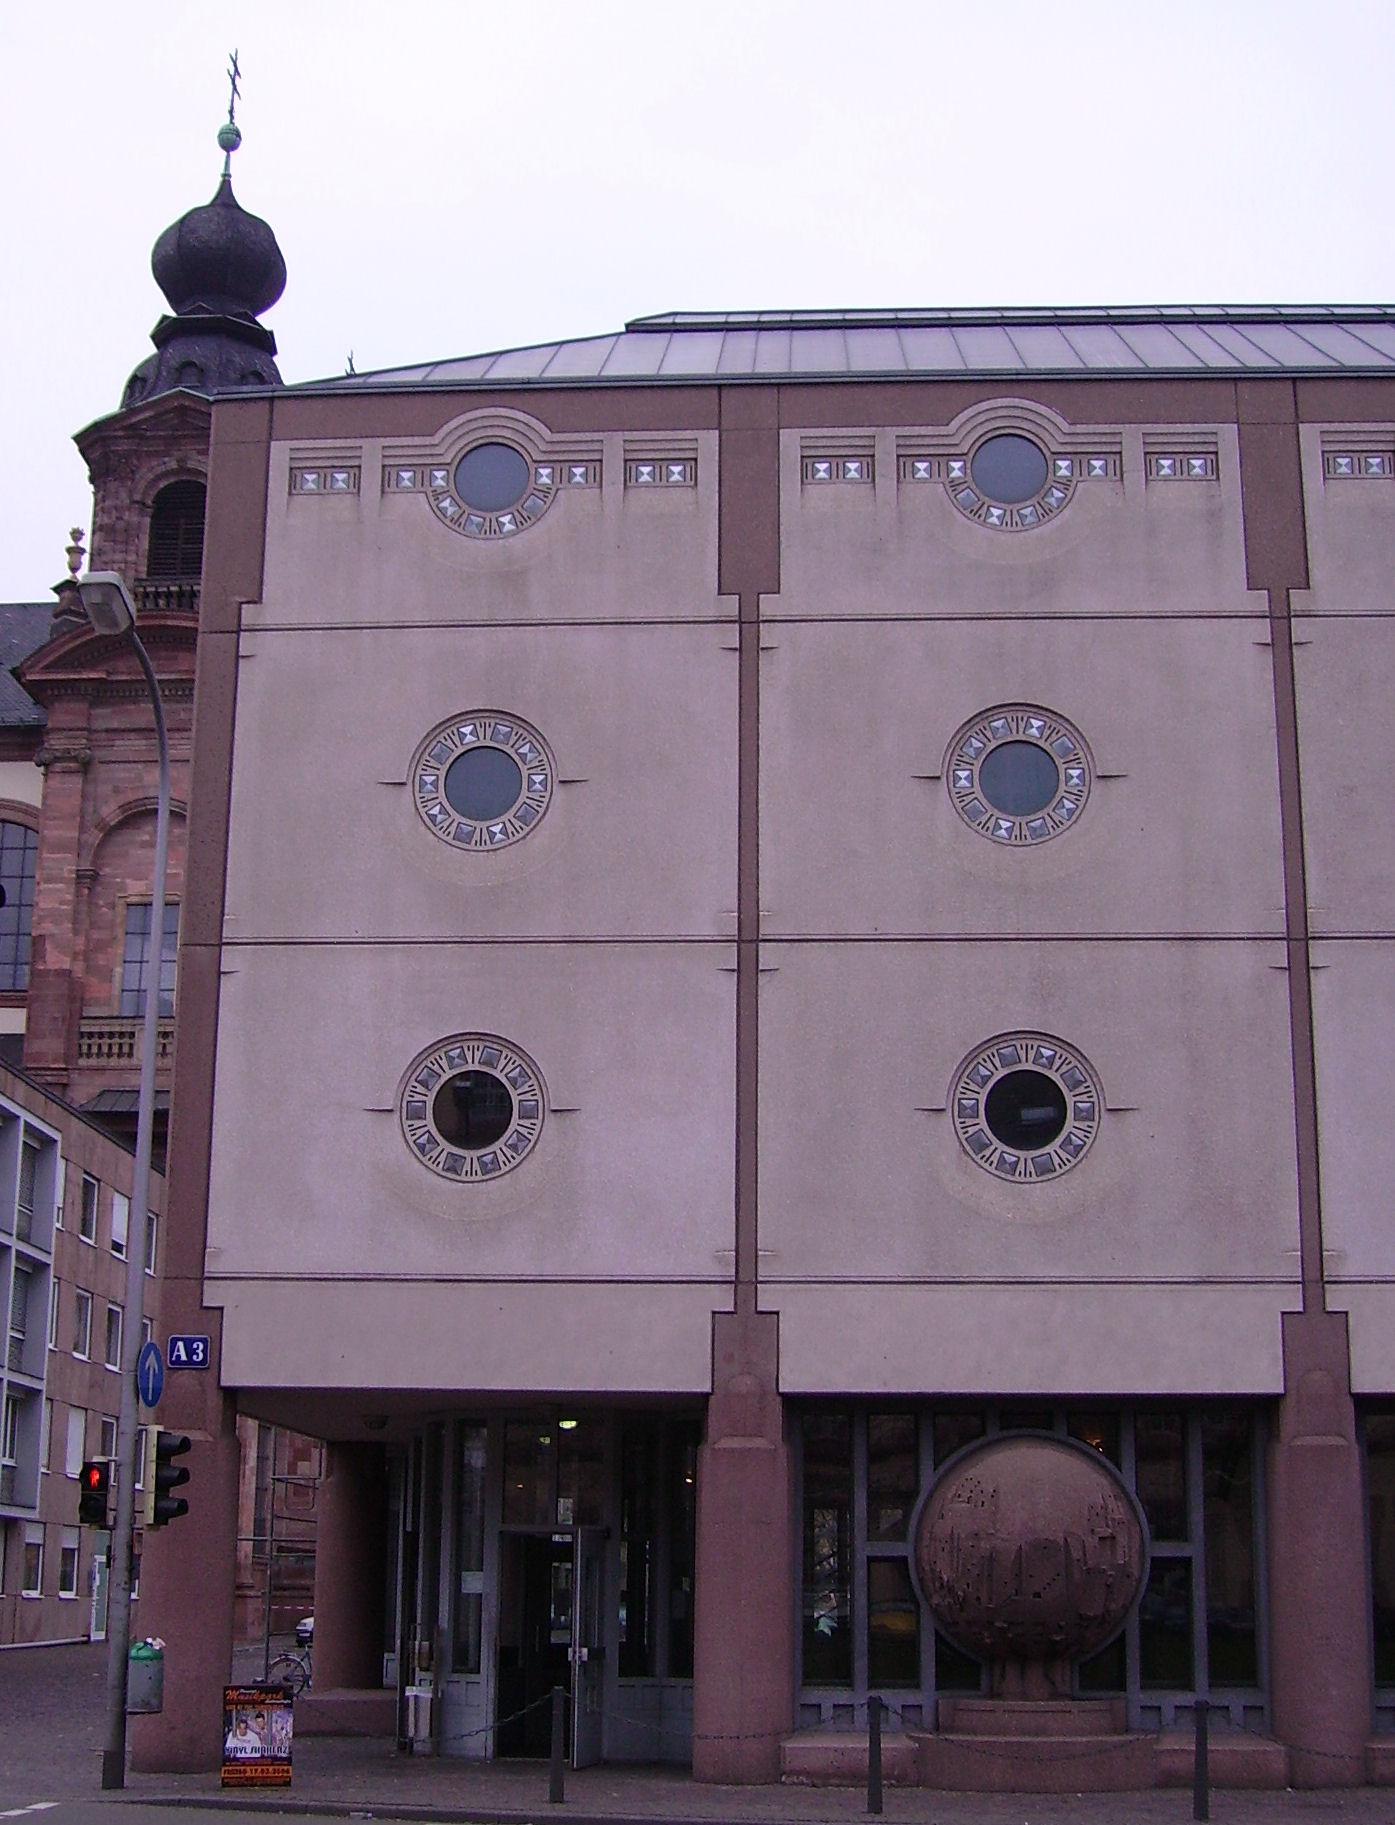 Universität mannheim semester dates